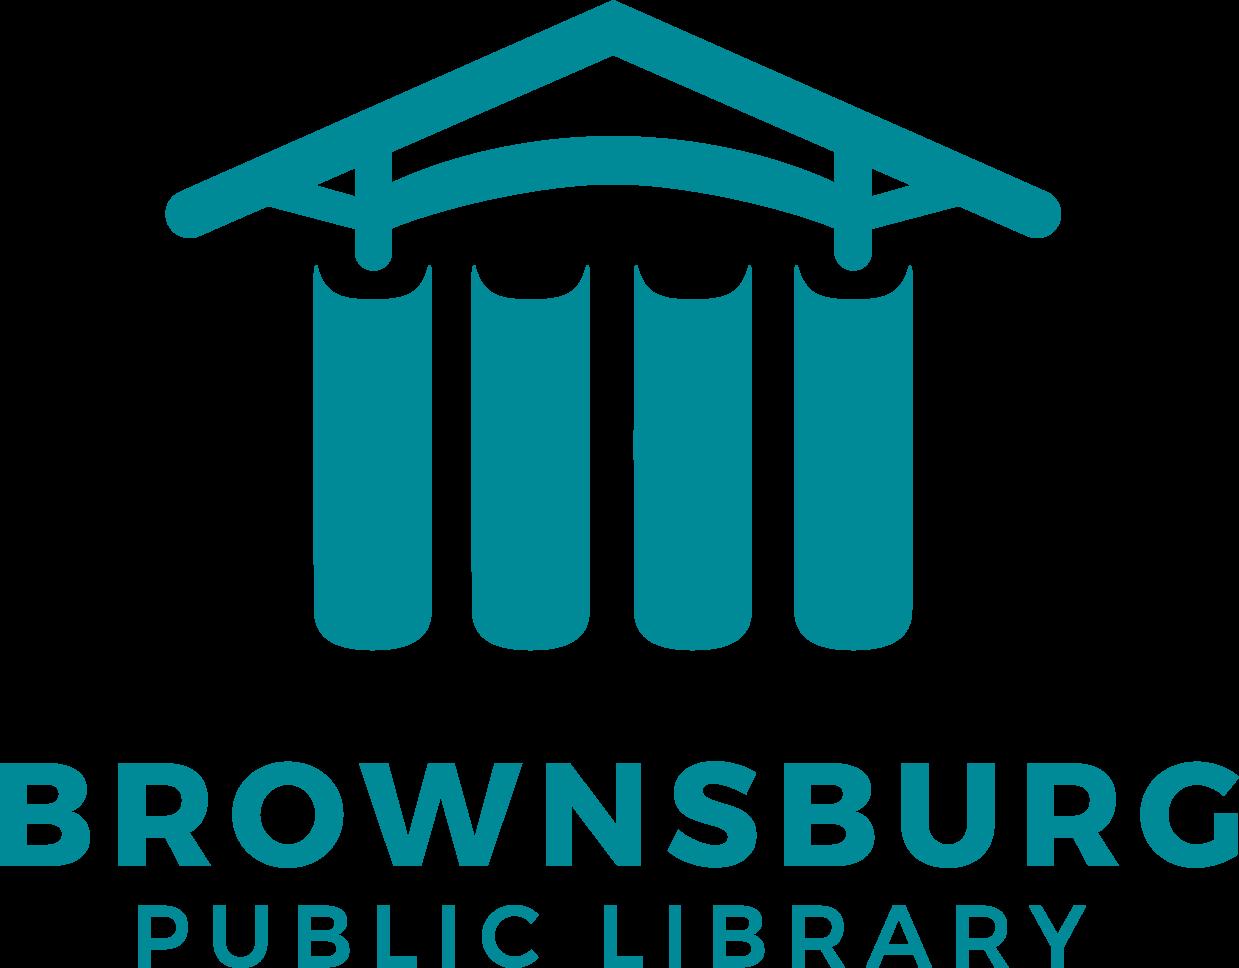 Brownsburg Public Library